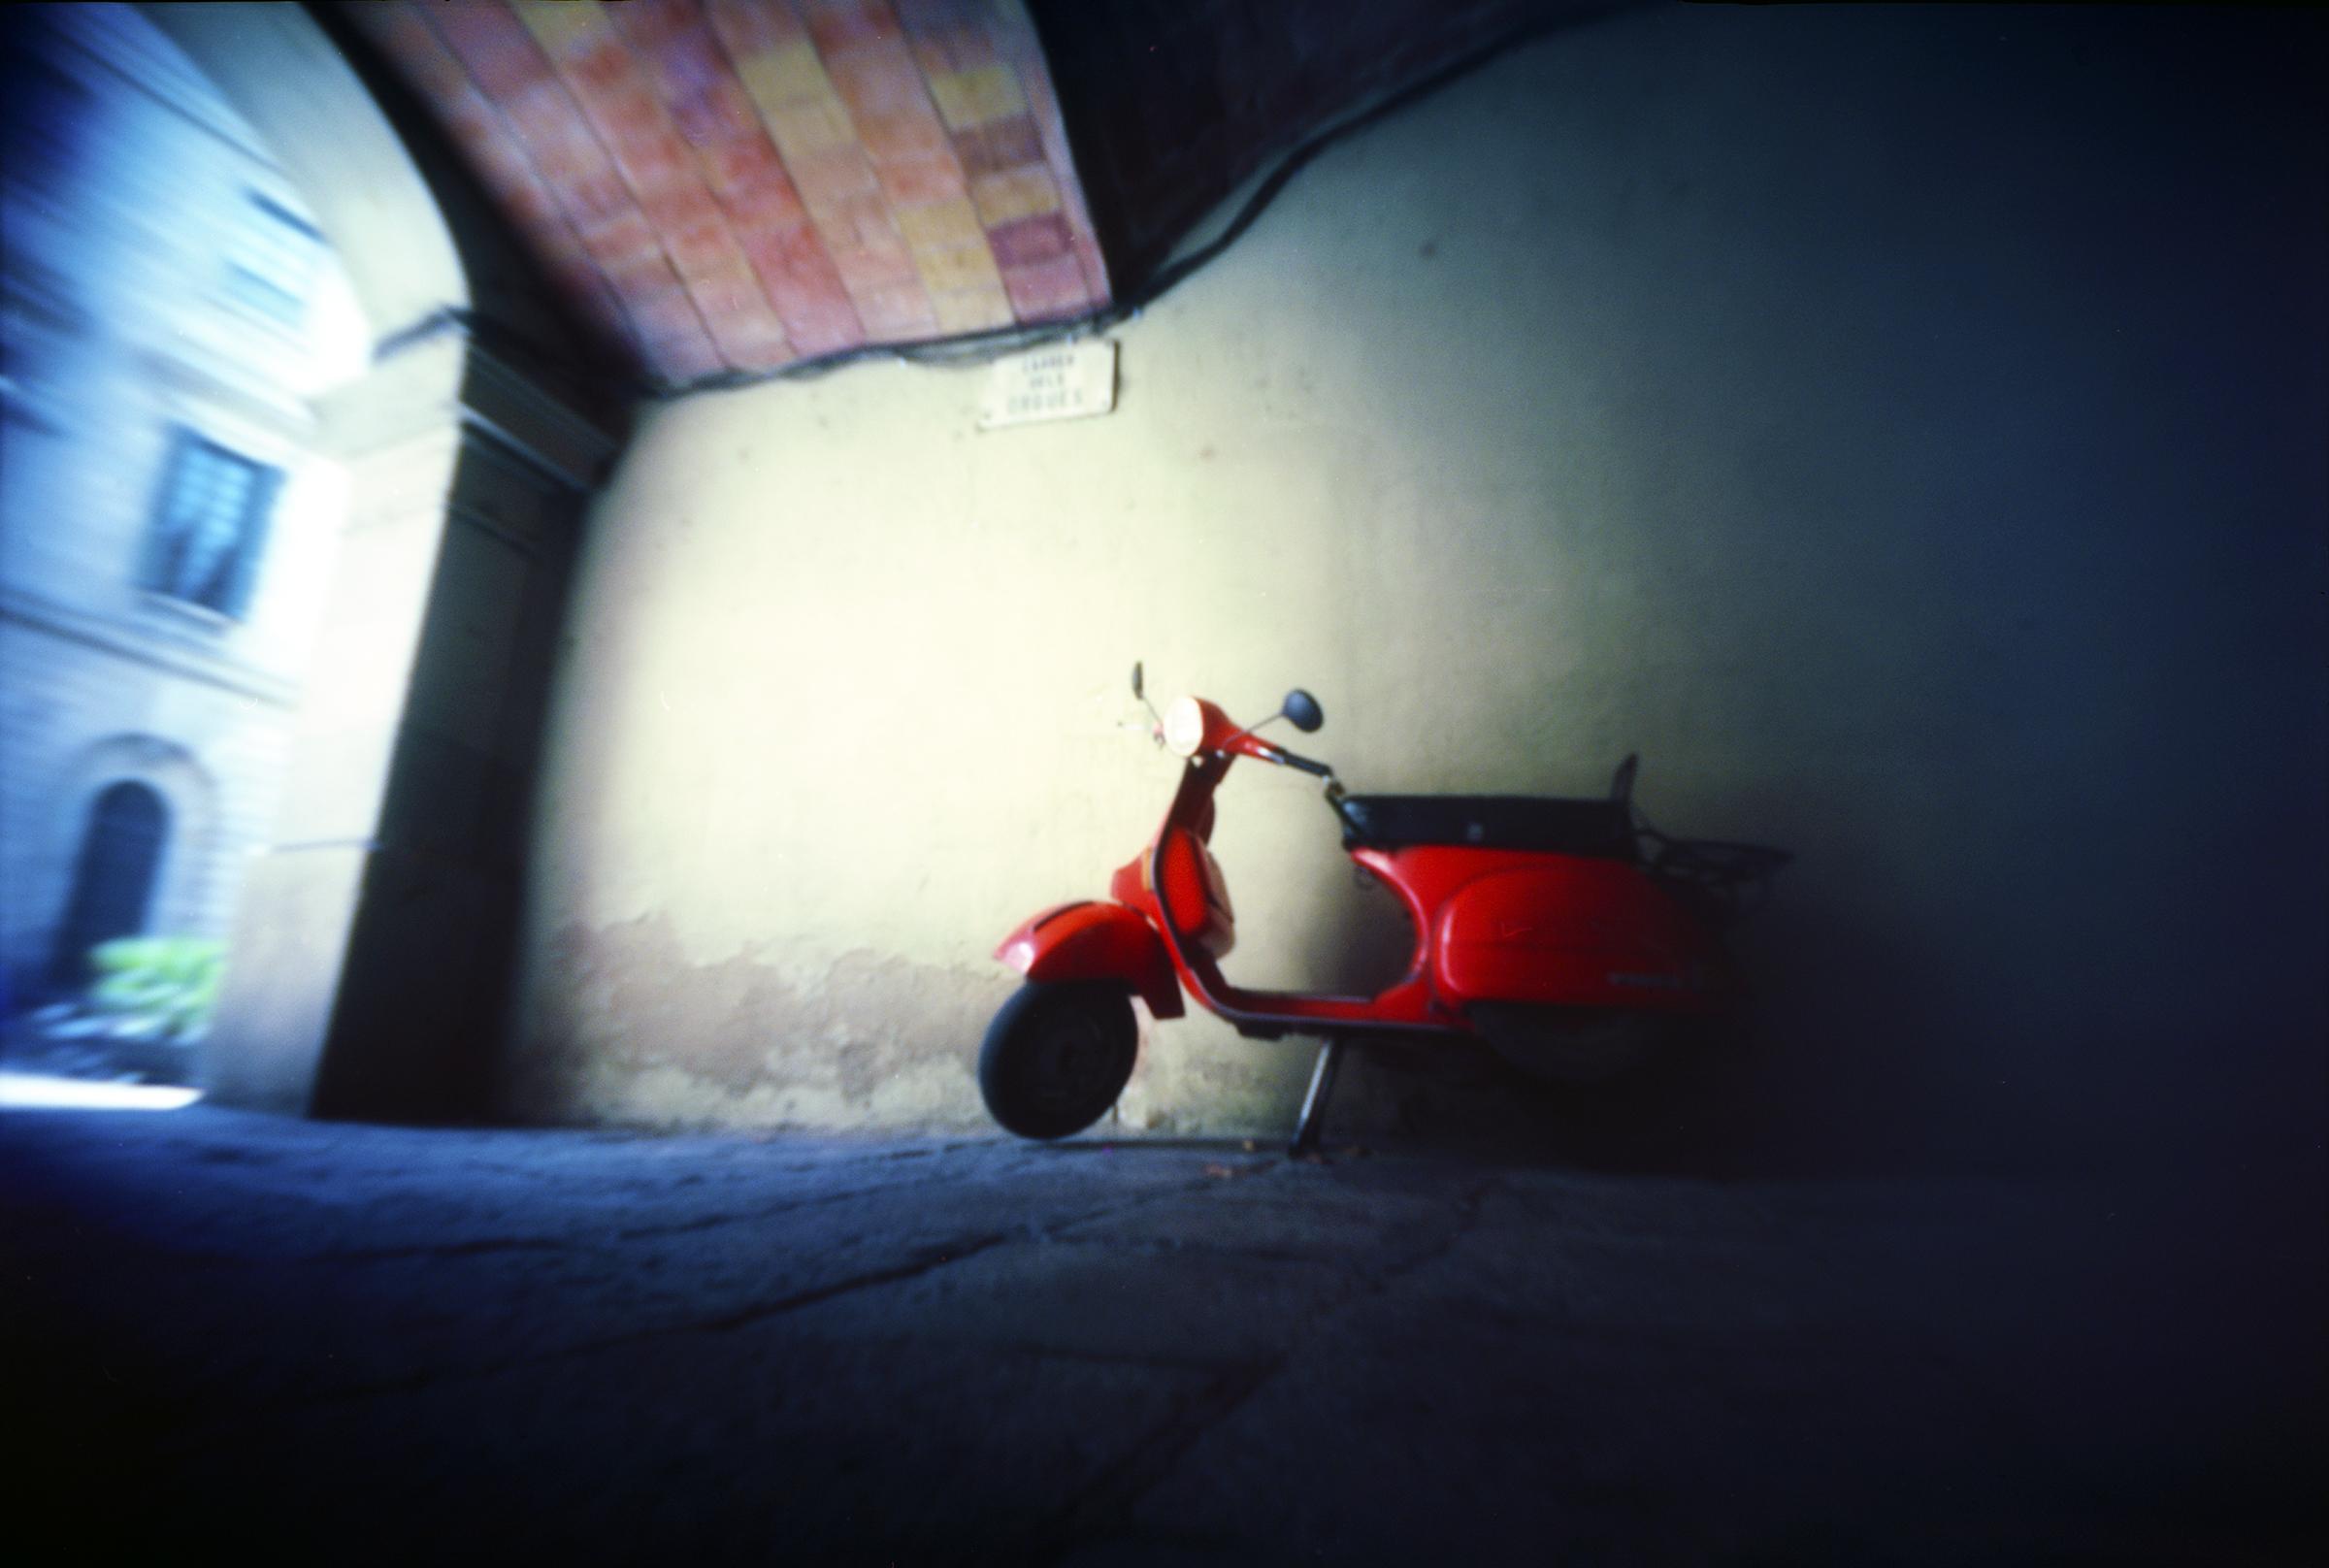 Red scooter - Barcelona, Spain - Aug 24th 2013 - Kodak Ektar 100 in a hacked MIOM Photax Blindé curved plane pinhole camera